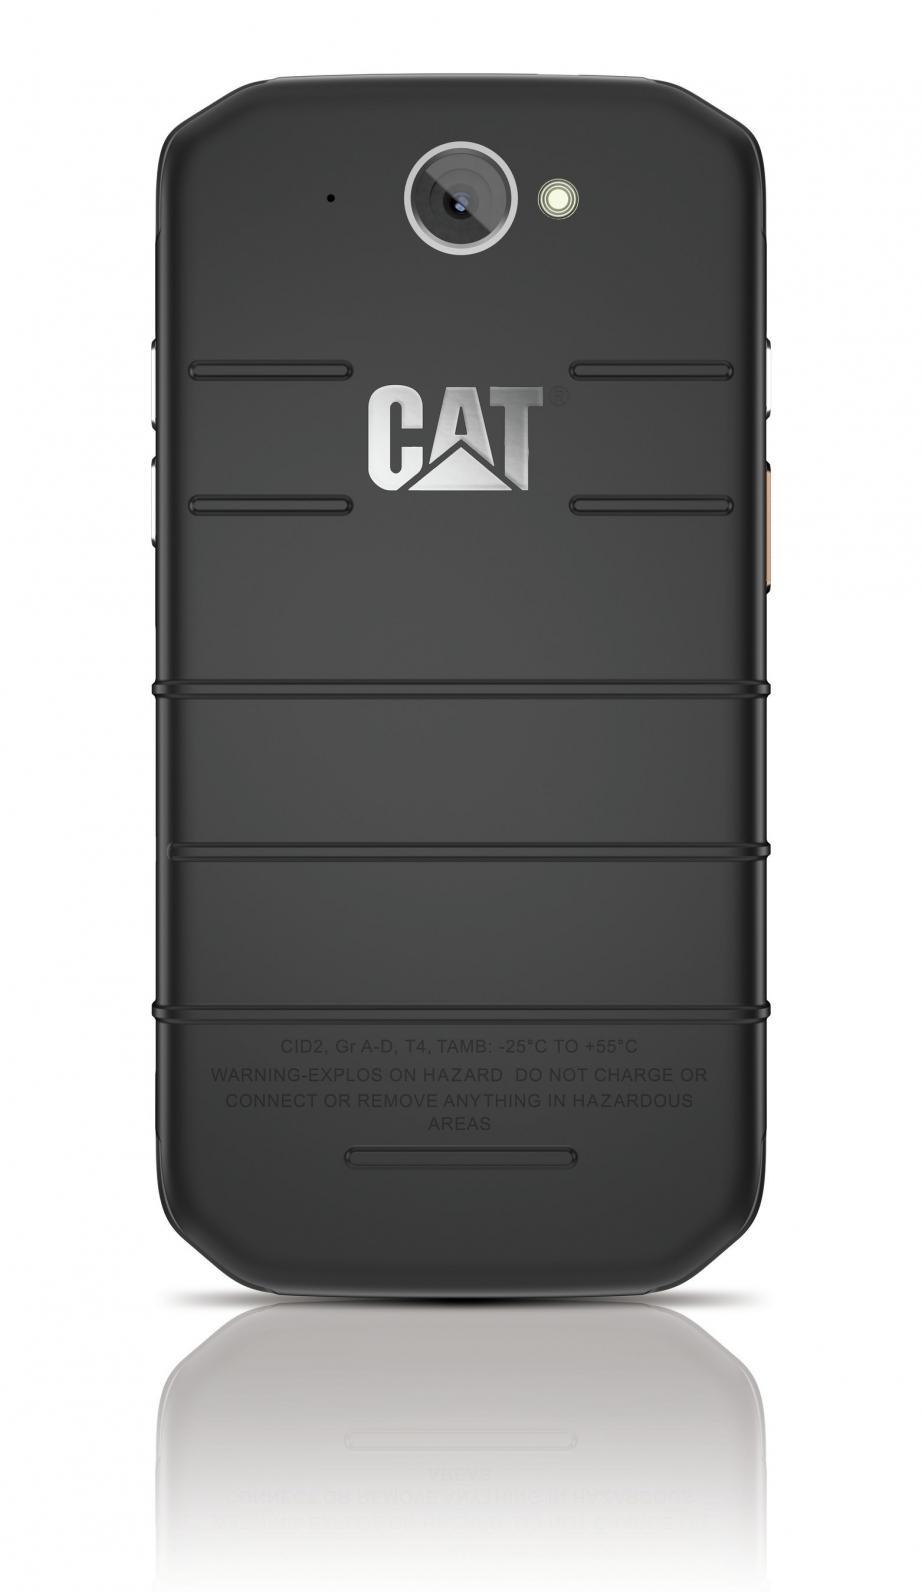 Cat_S48c_Smartphone (2).jpg